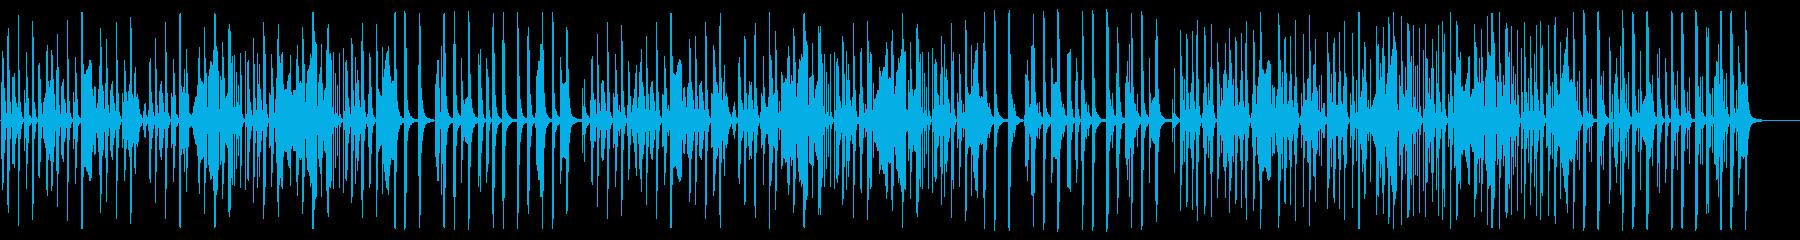 YouTube ハーモニカ・ピチカートの再生済みの波形